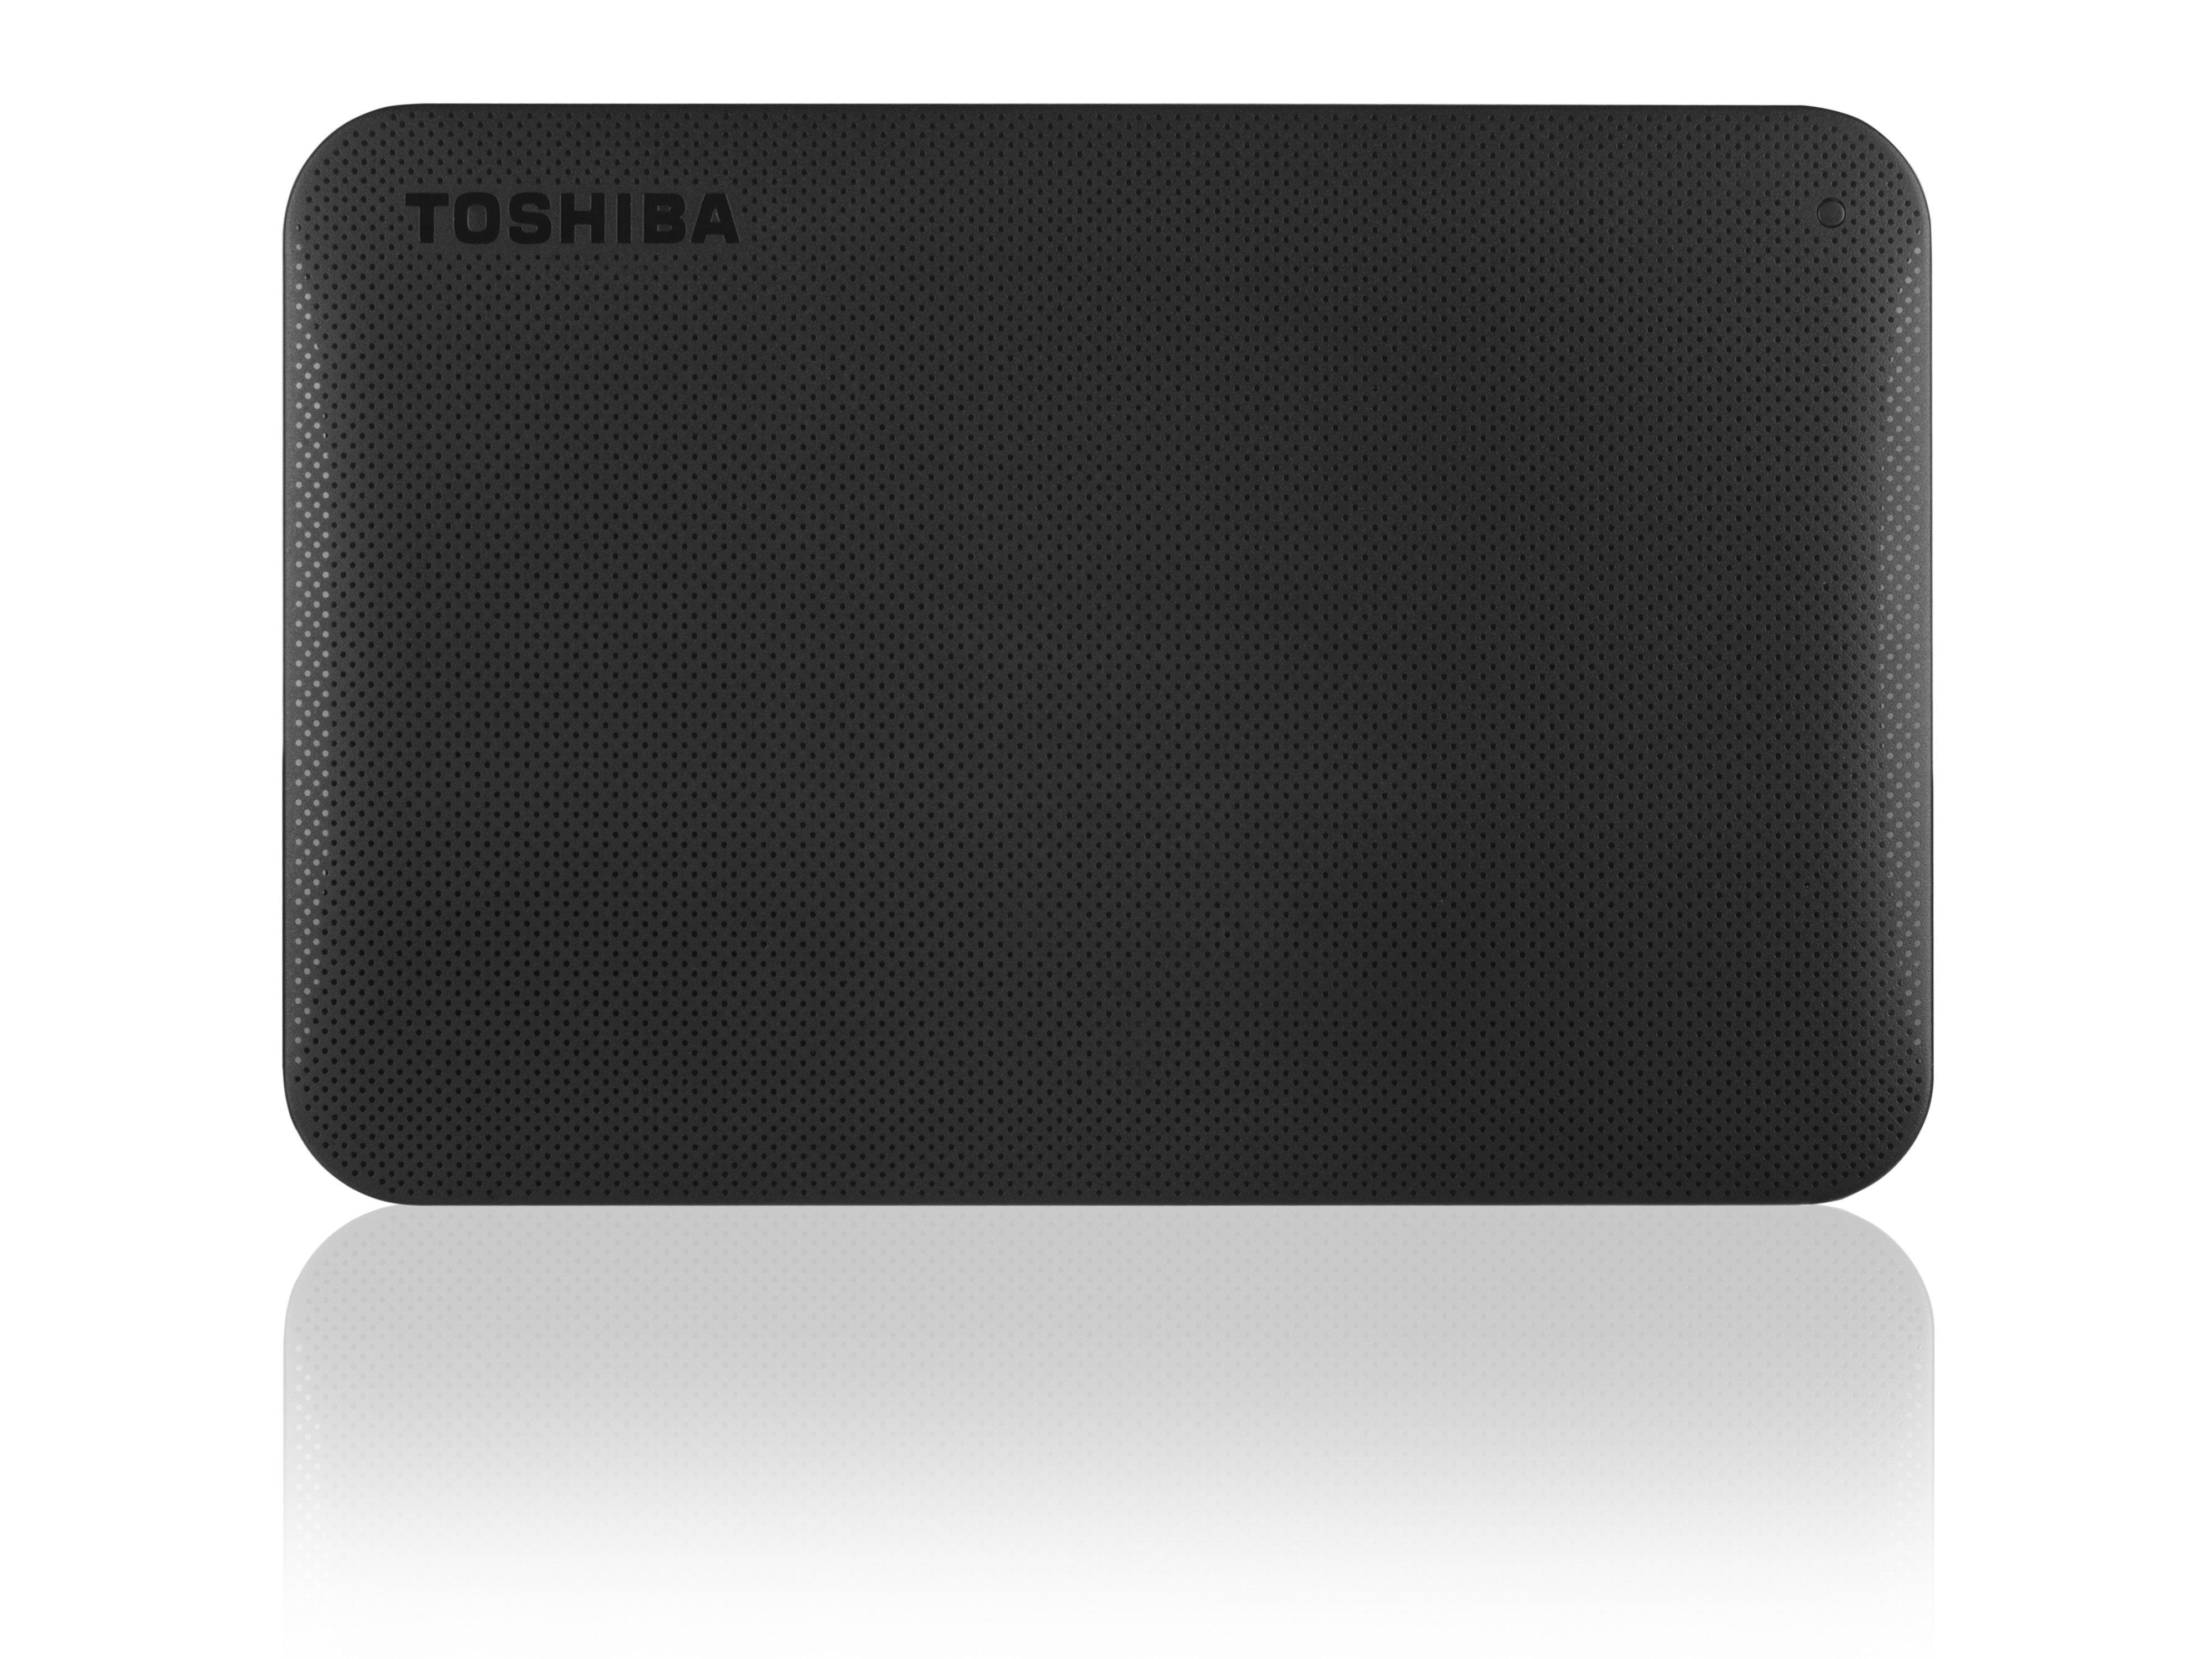 Toshiba externe harde schijf Canvio Ready 2TB zwart